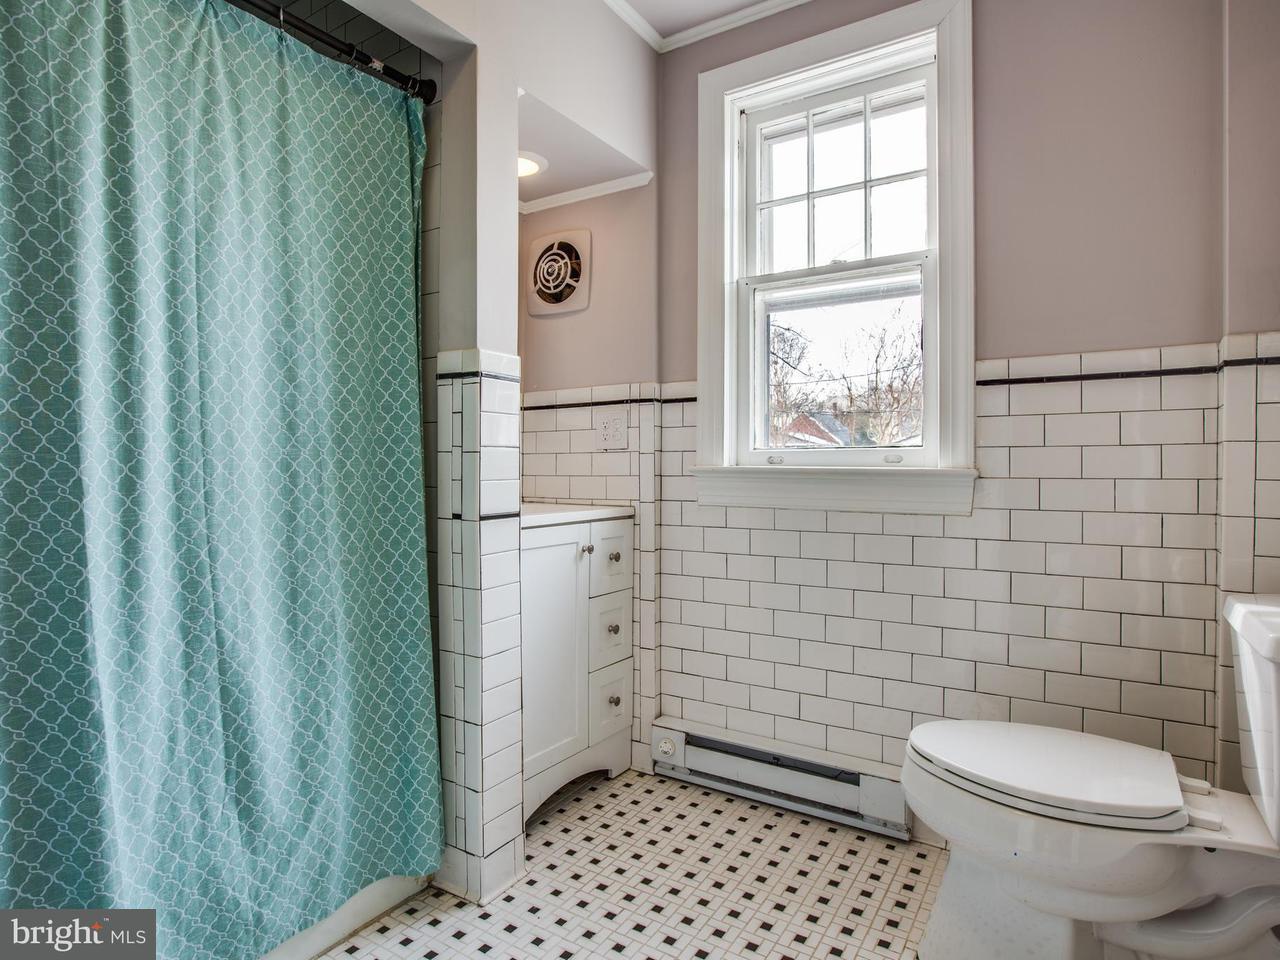 Additional photo for property listing at 808 Marye Street 808 Marye Street Fredericksburg, Virginia 22401 Estados Unidos